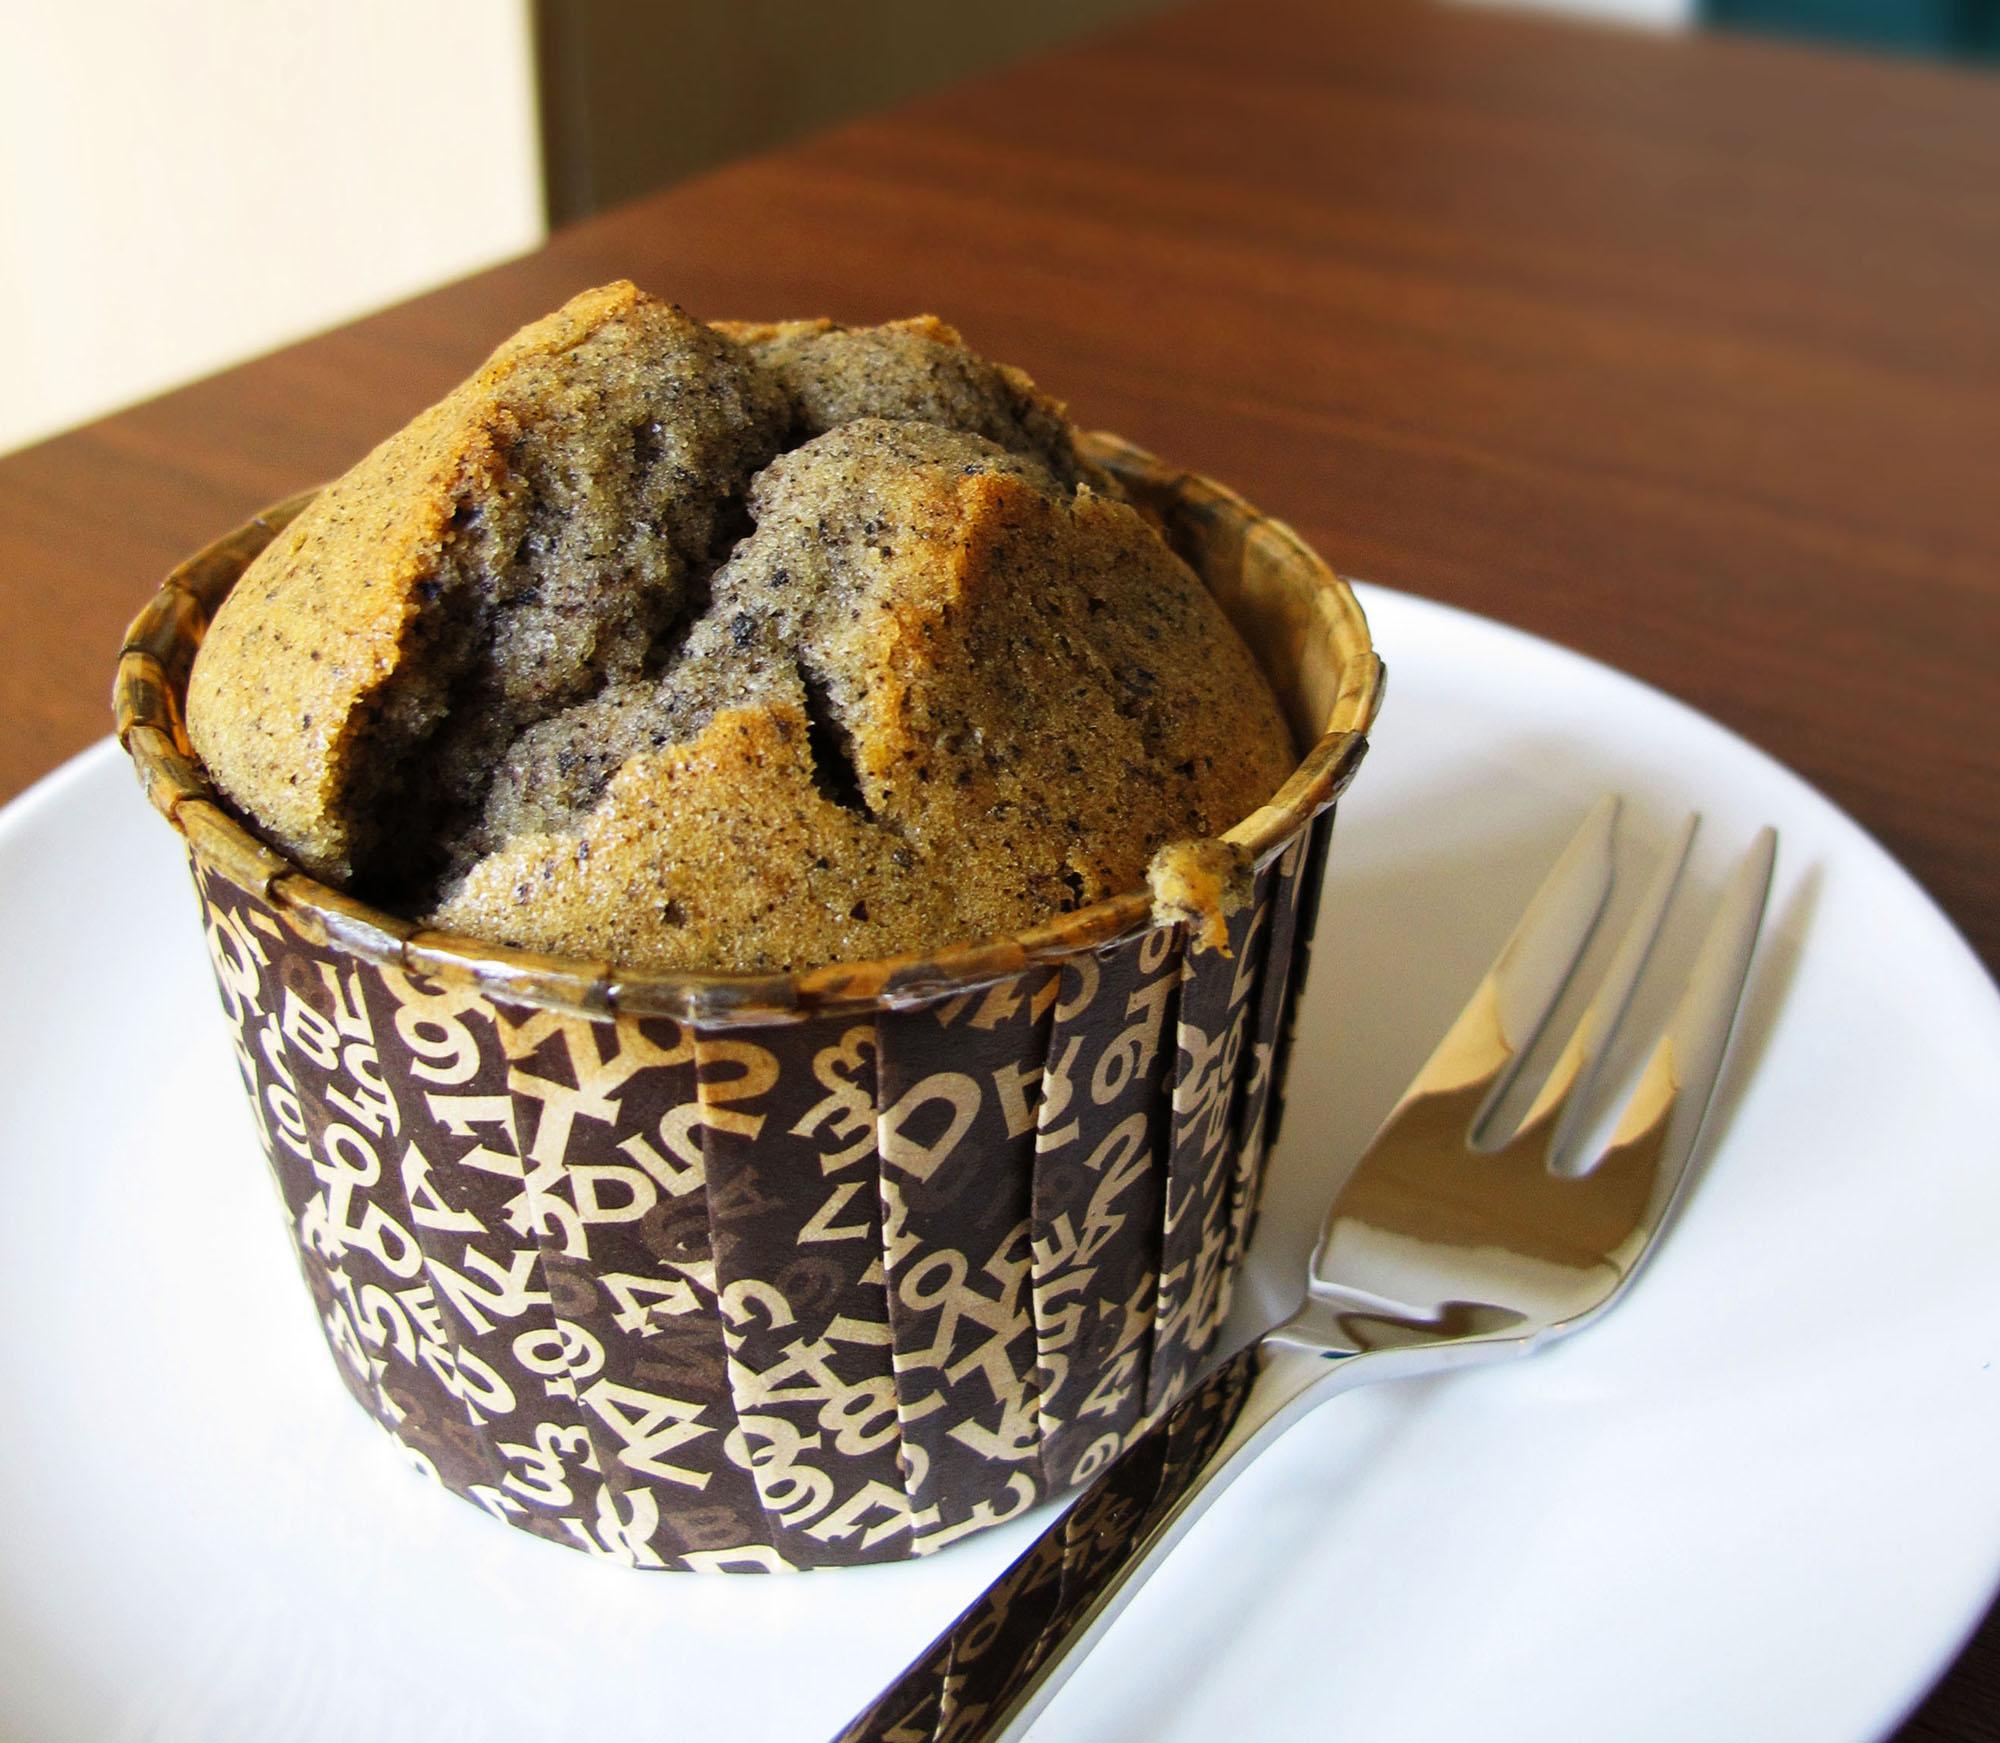 Black Sesame Muffin with Lemon